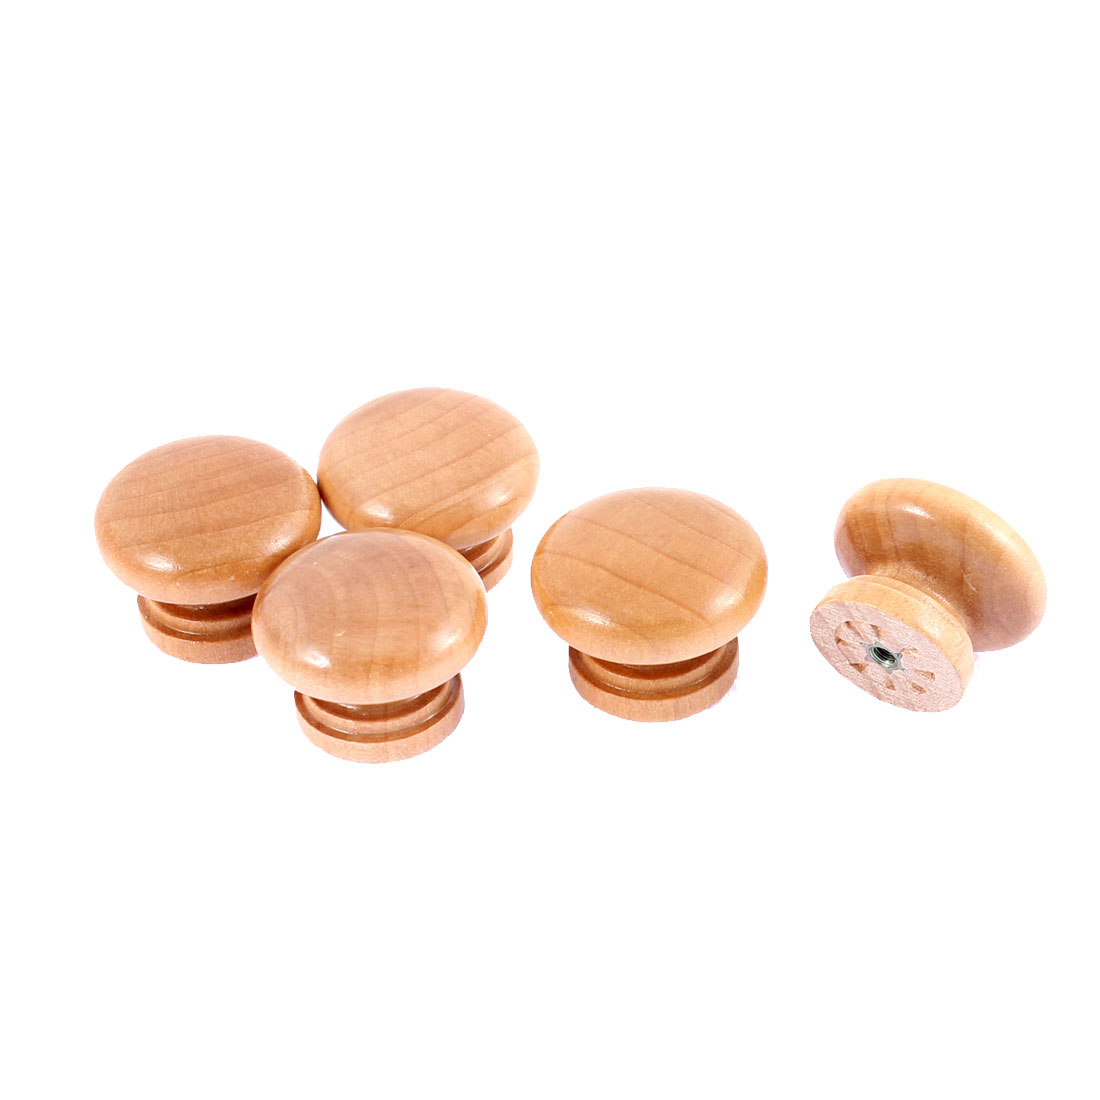 Drawer Cabinet Round Wood Knob Pull Handles Khaki 1.3 Inch Diameter 5pcs